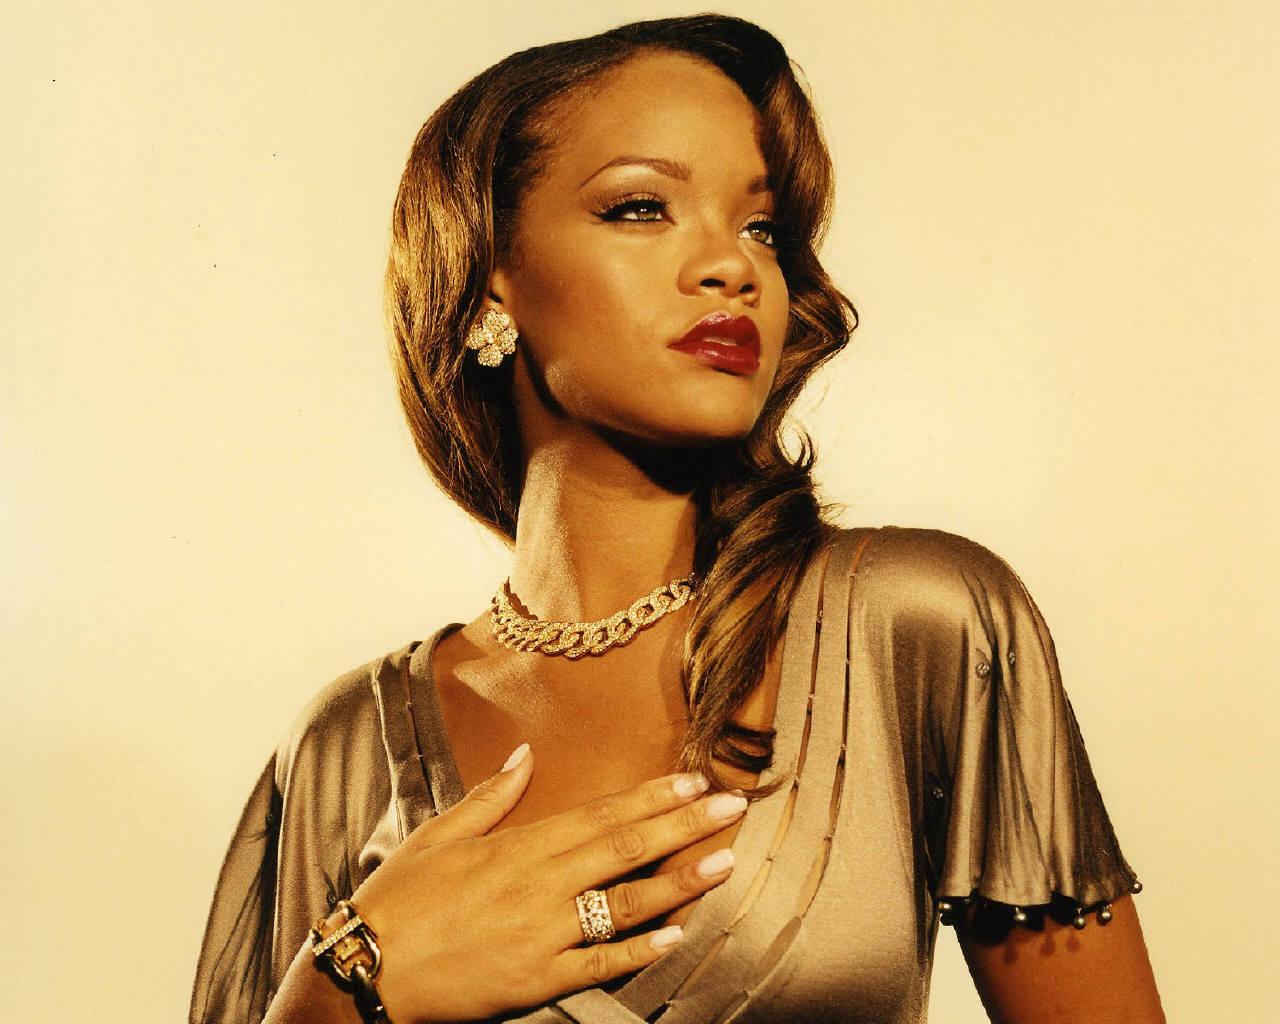 http://images.fanpop.com/images/image_uploads/Rihanna-rihanna-166370_1280_1024.jpg